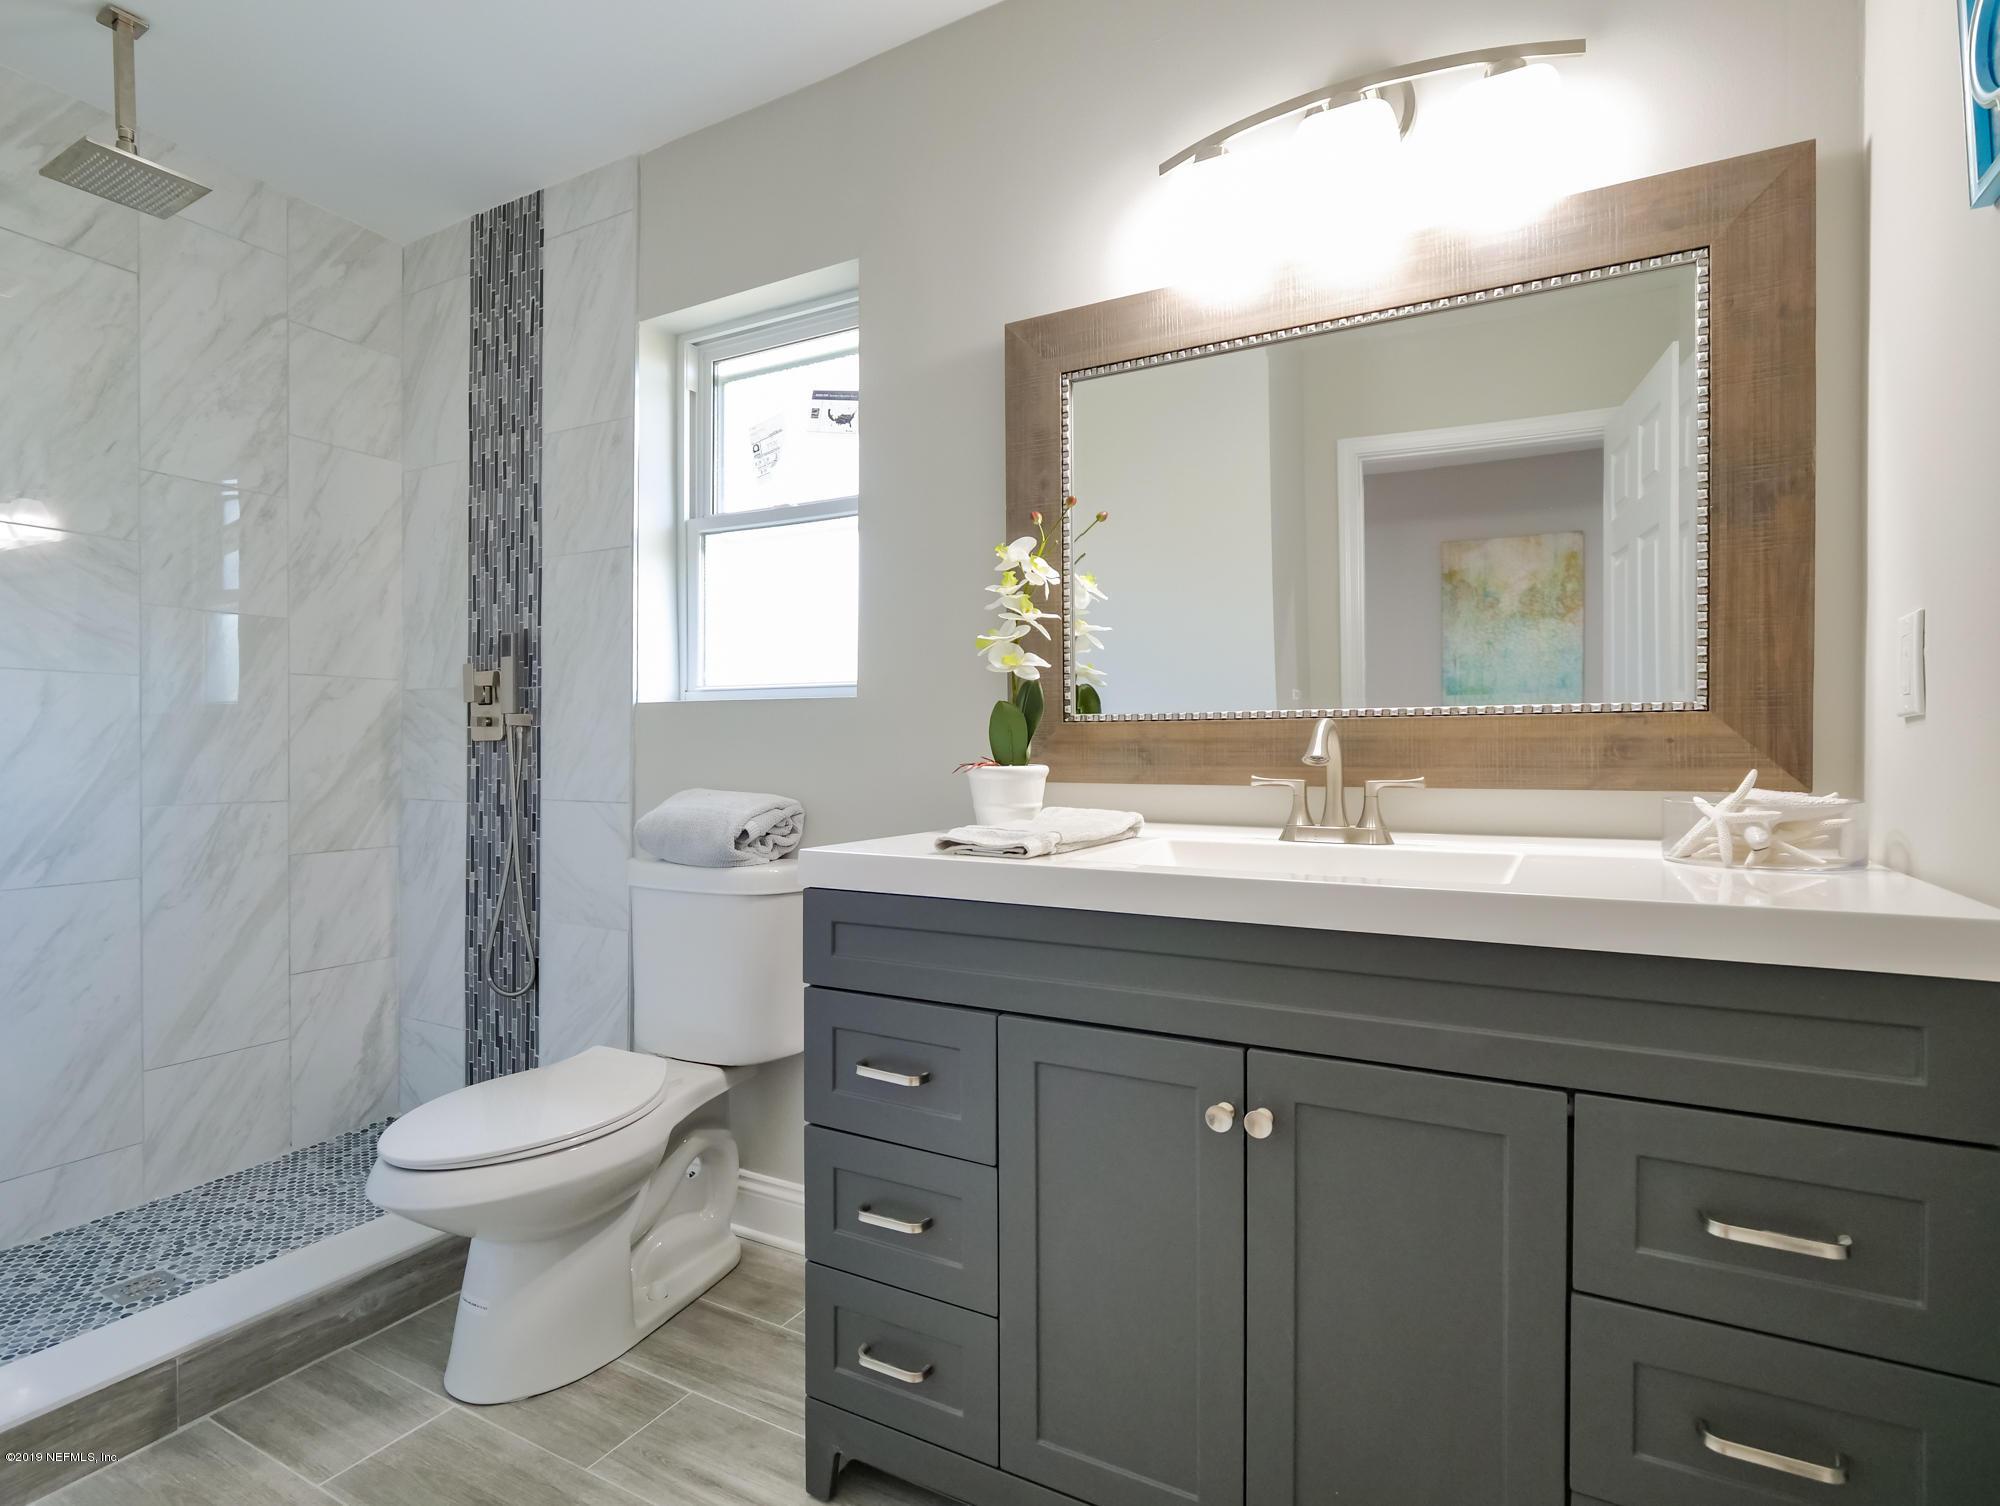 745 AMBERJACK, ATLANTIC BEACH, FLORIDA 32233, 3 Bedrooms Bedrooms, ,2 BathroomsBathrooms,Residential - single family,For sale,AMBERJACK,987034